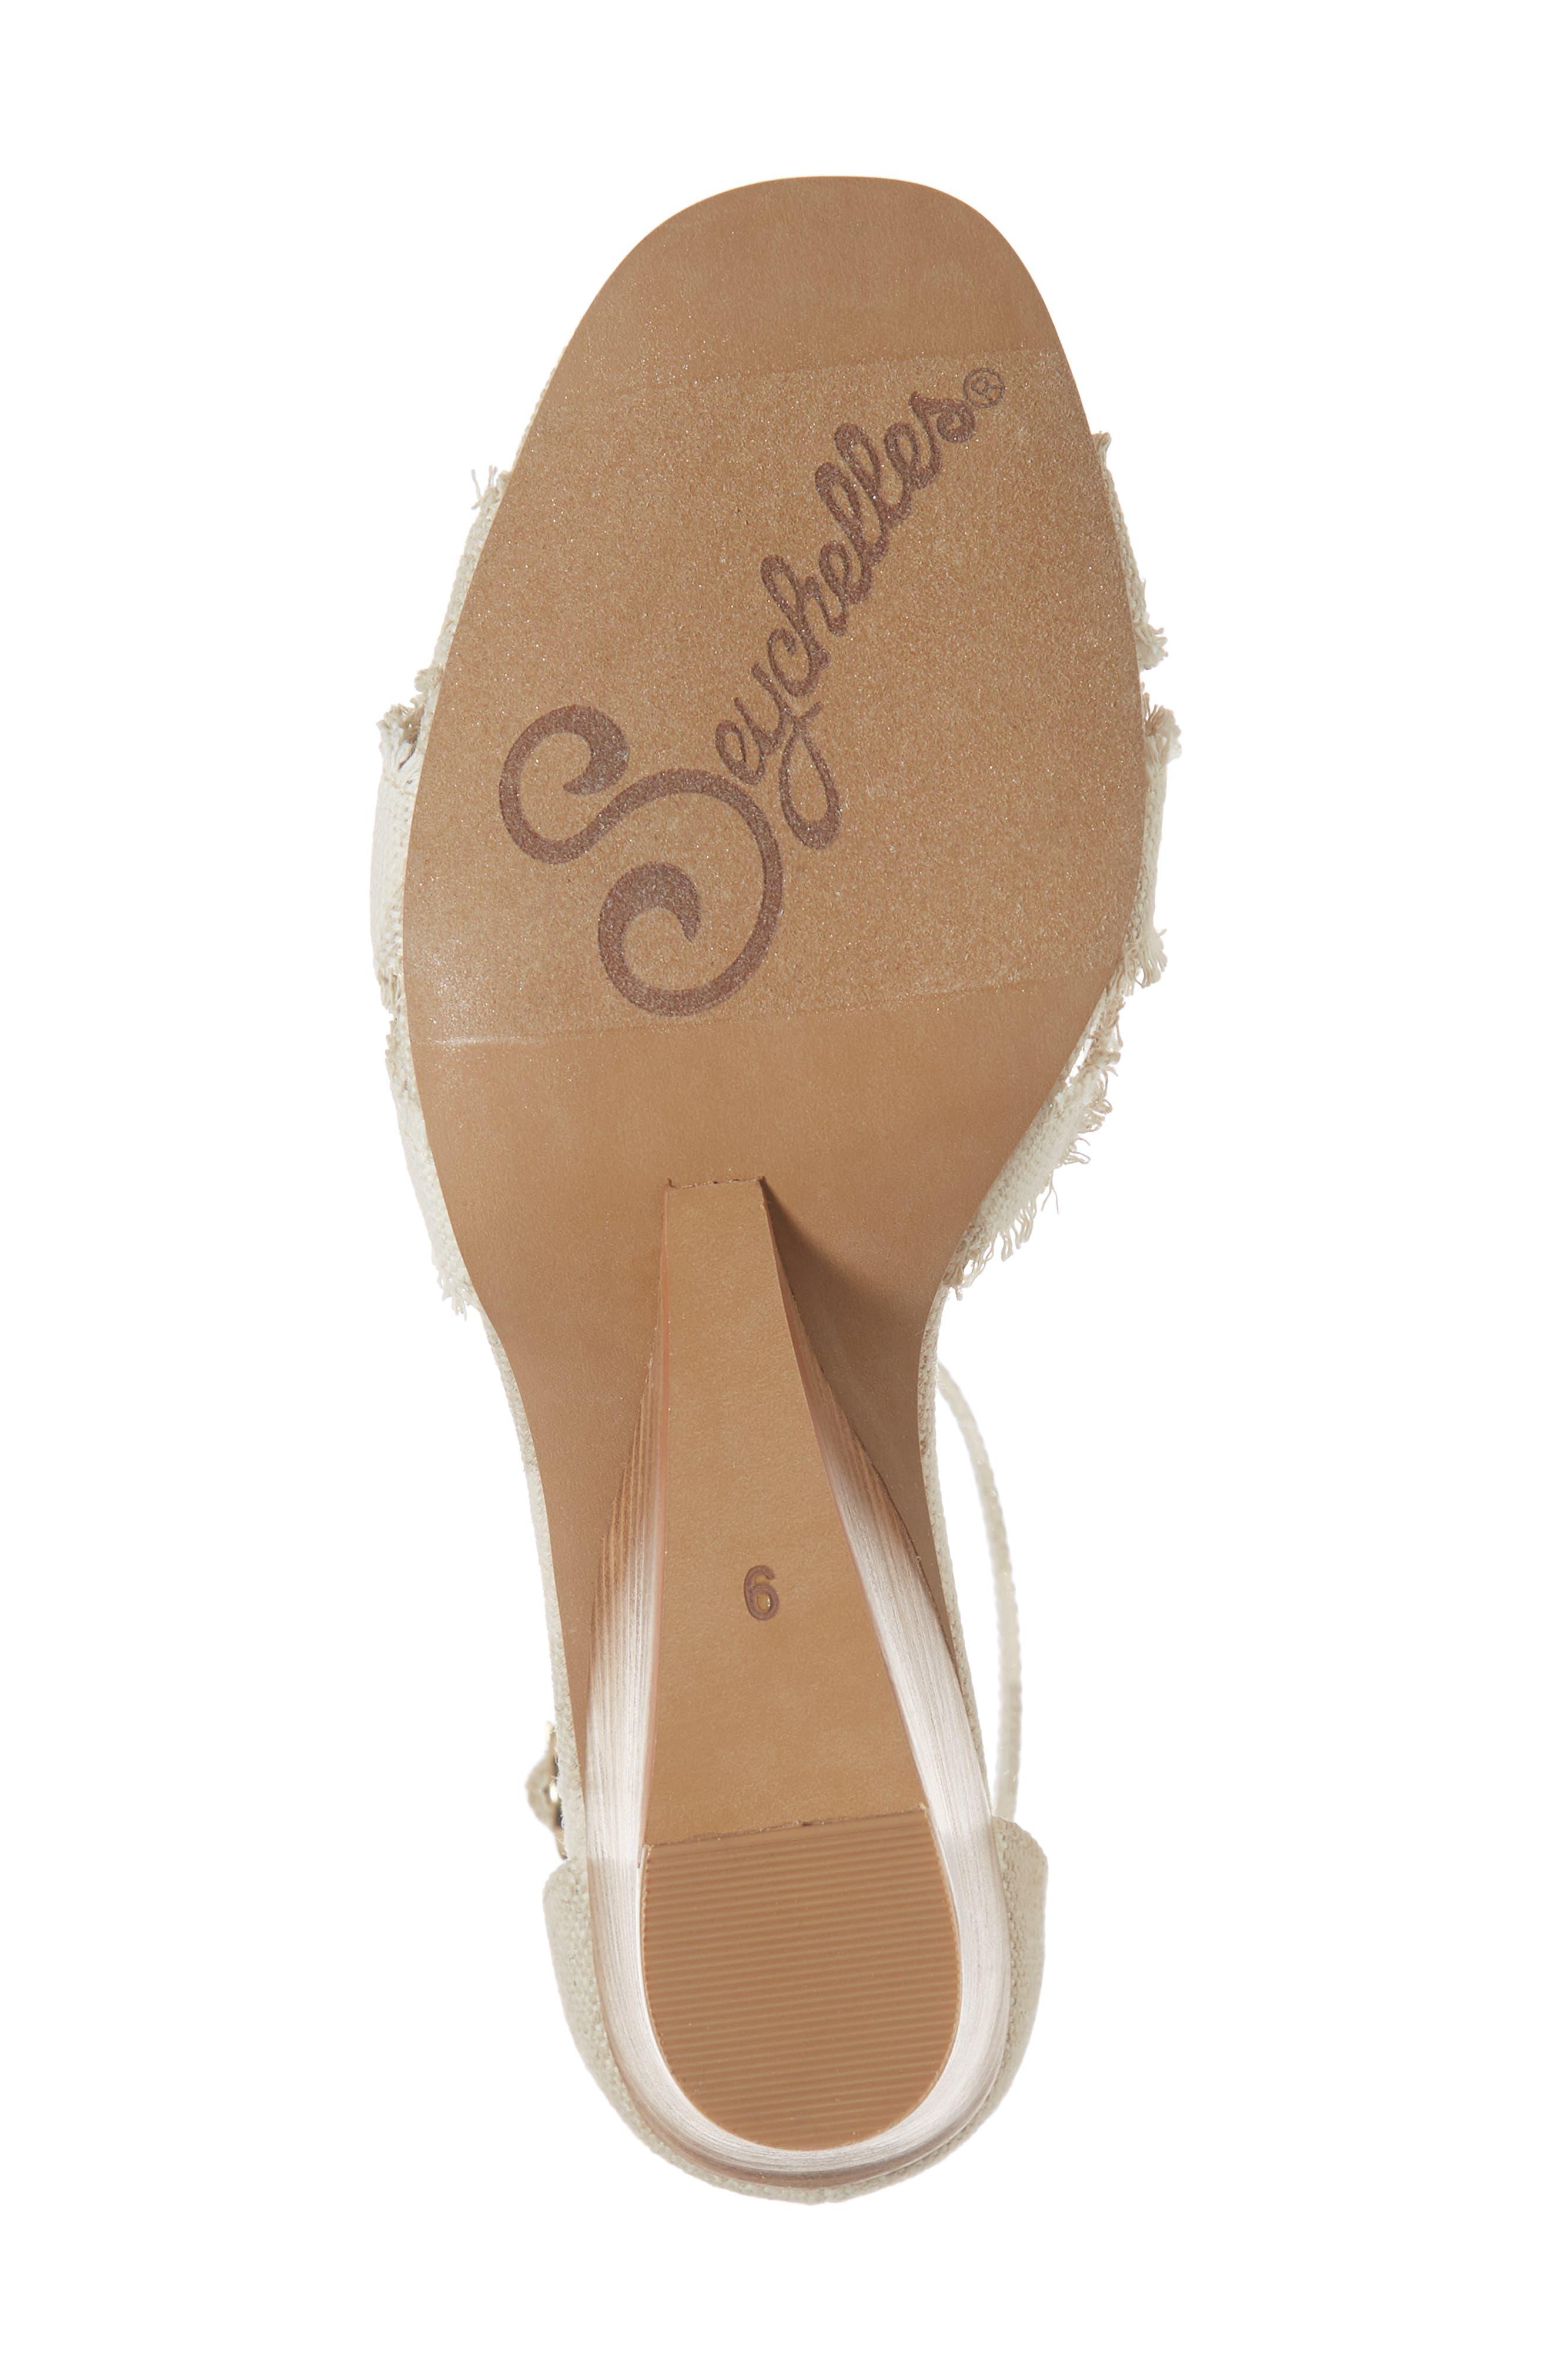 Sunrays Wedge Sandal,                             Alternate thumbnail 6, color,                             NATURAL STRIPE FABRIC